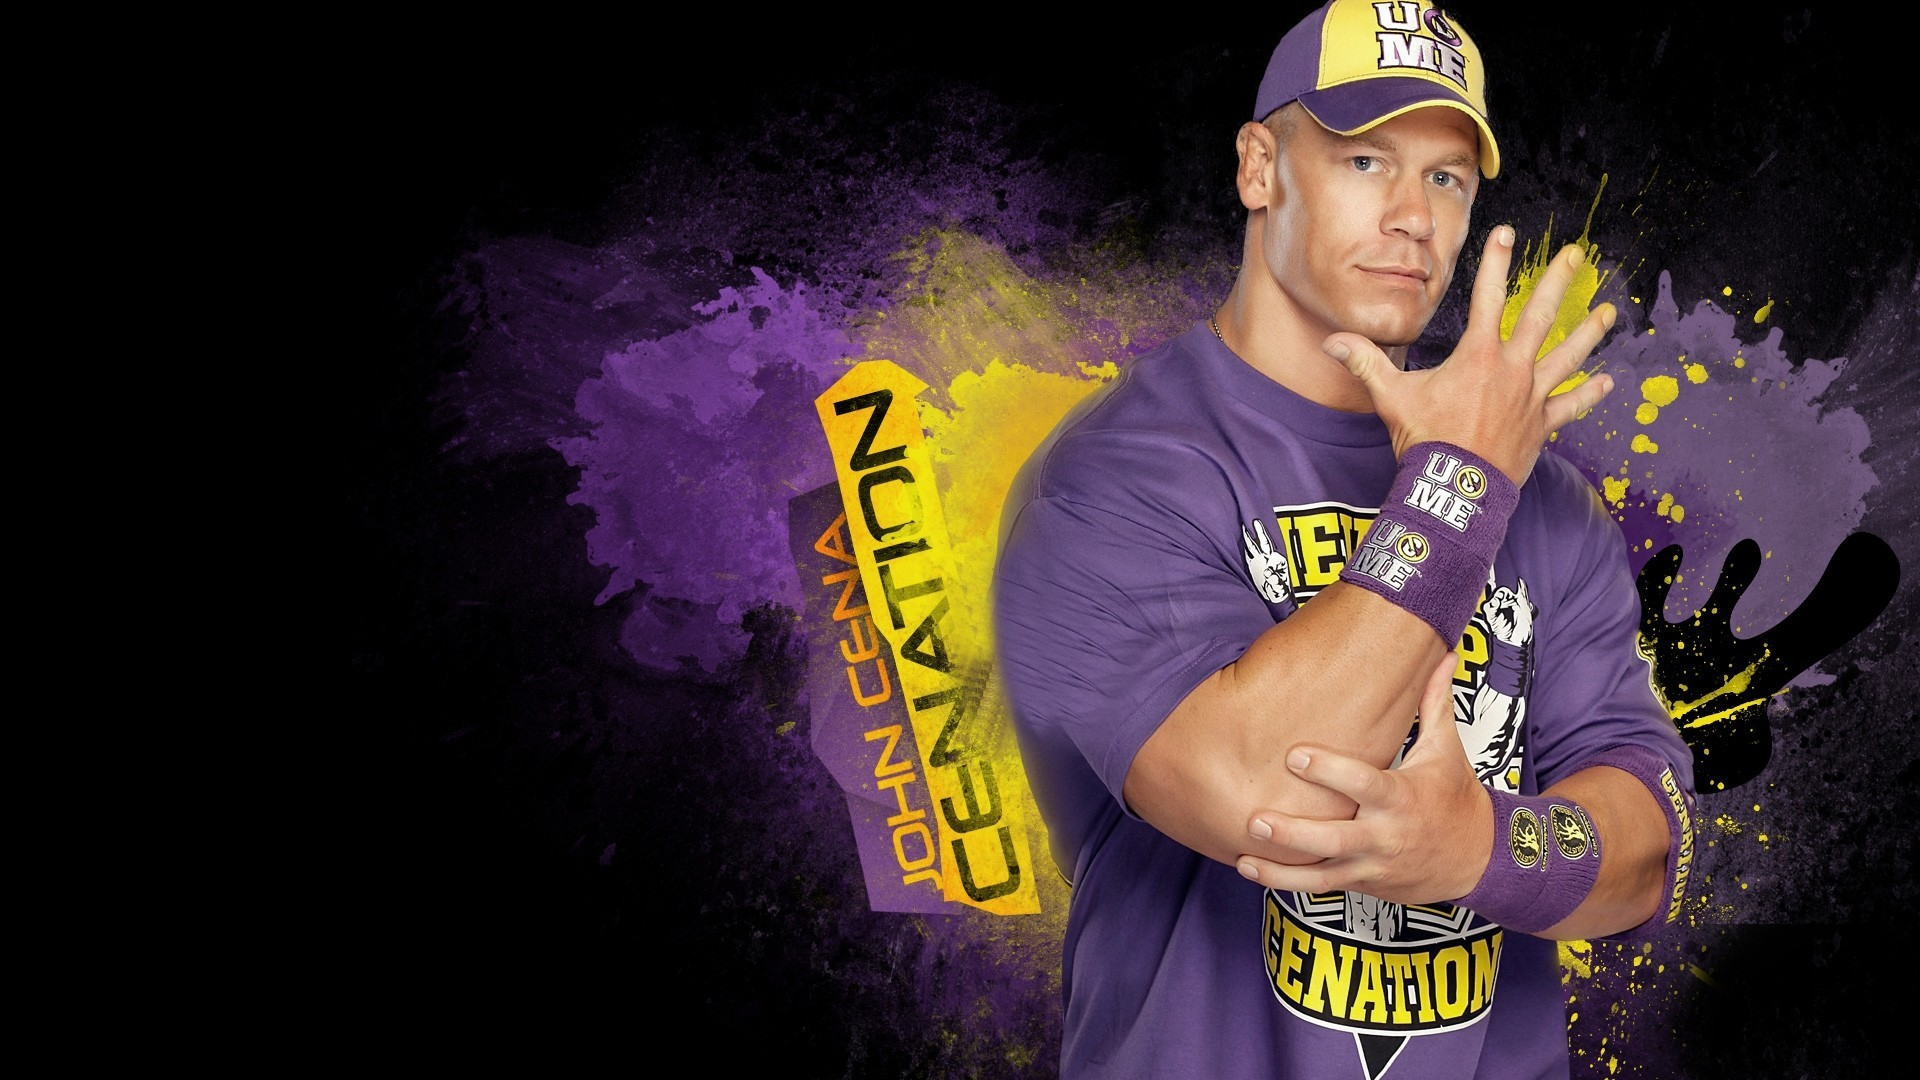 John Cena Wallpapers   Beautiful John Cena Picture